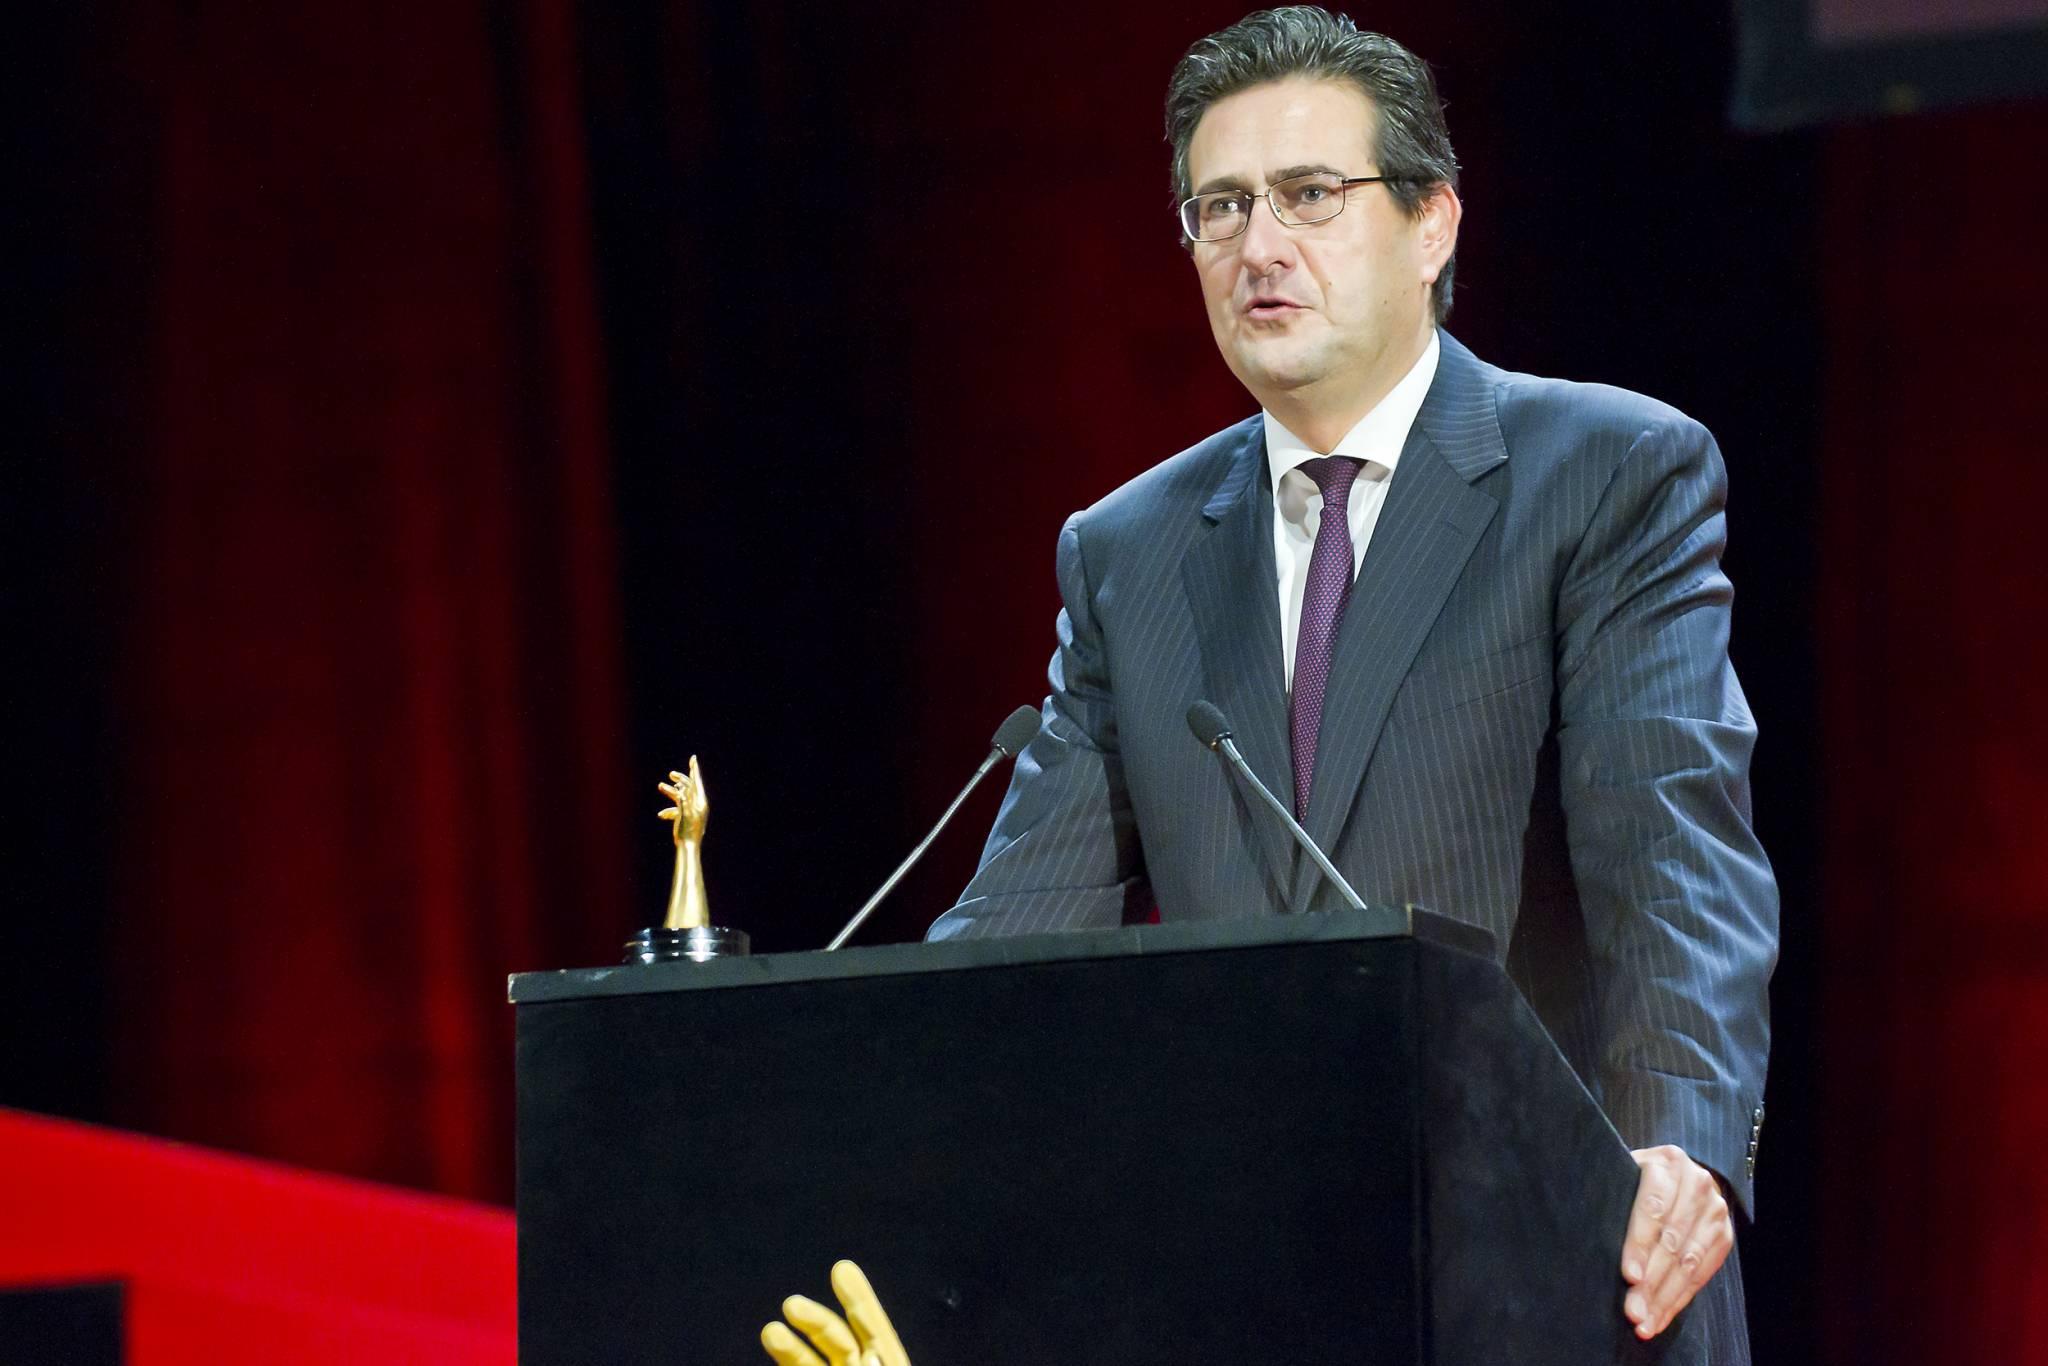 Luc Perramond, CEO of La Montre Hermès, the winner brand of the 2011 Men's Watch Prize